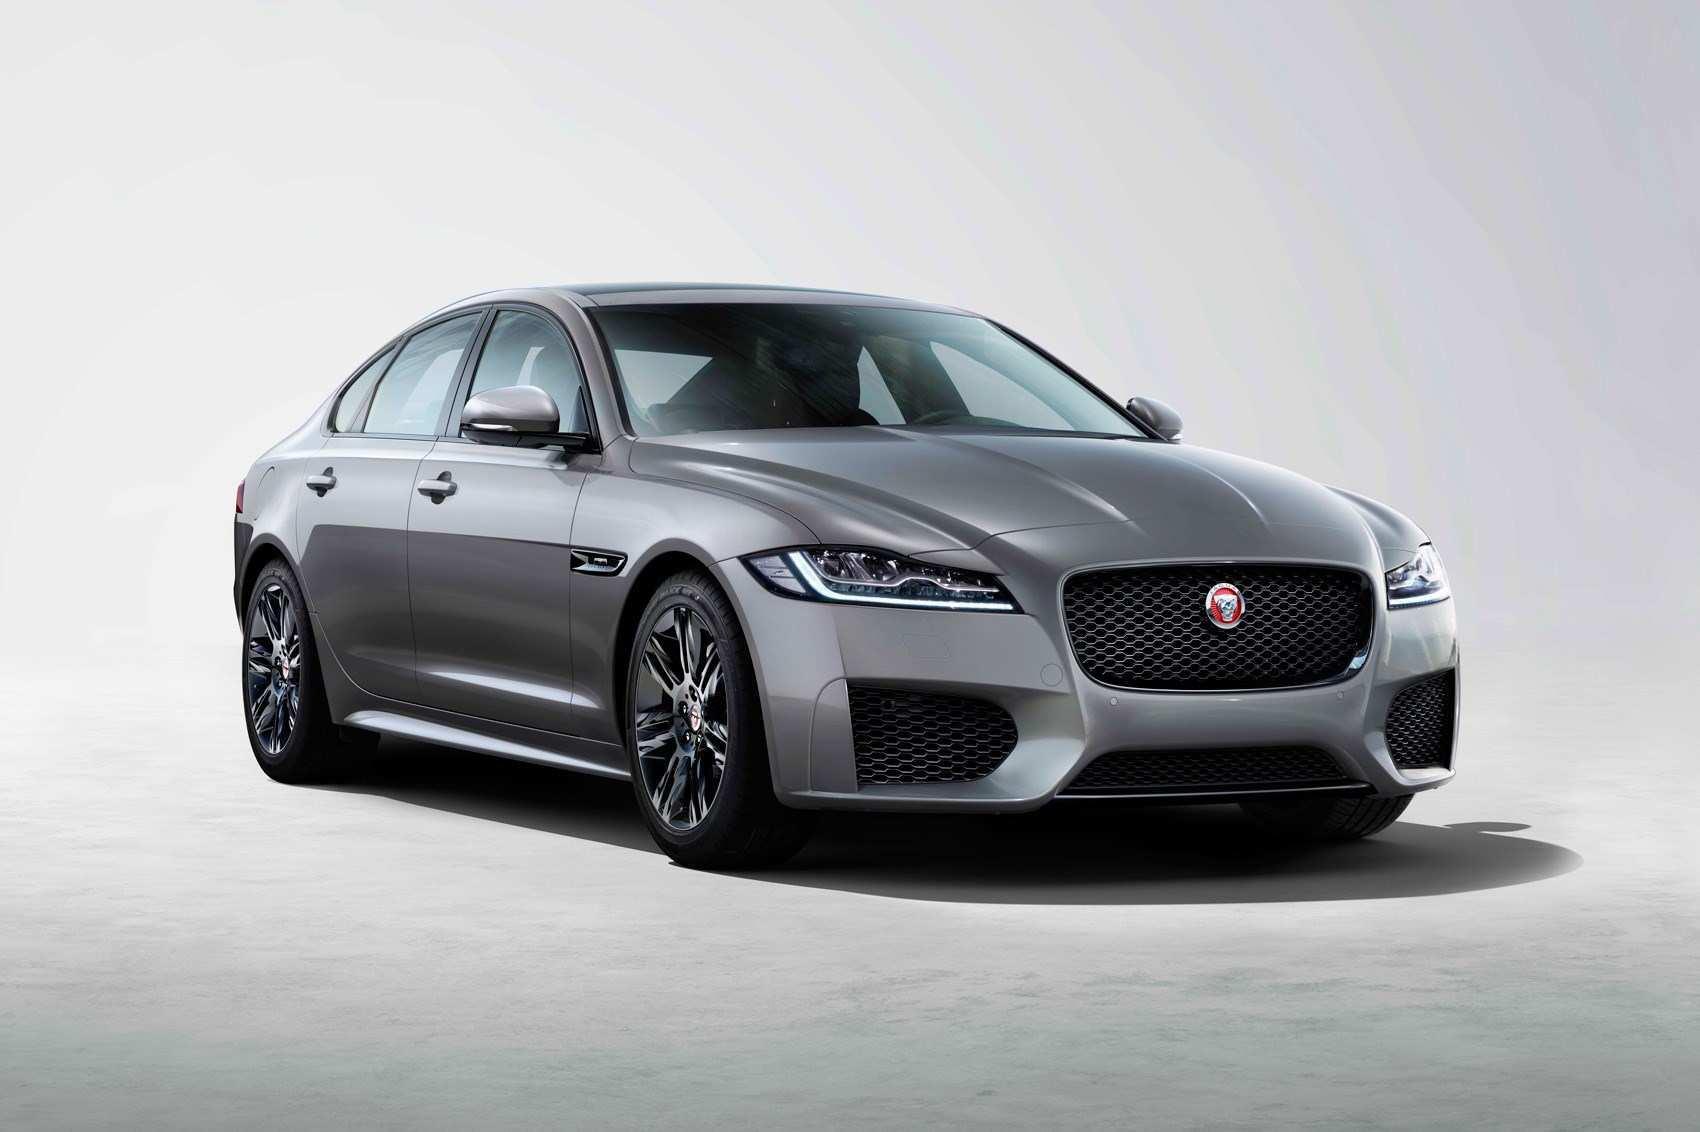 19 New Jaguar Xf Facelift 2019 Exterior with Jaguar Xf Facelift 2019